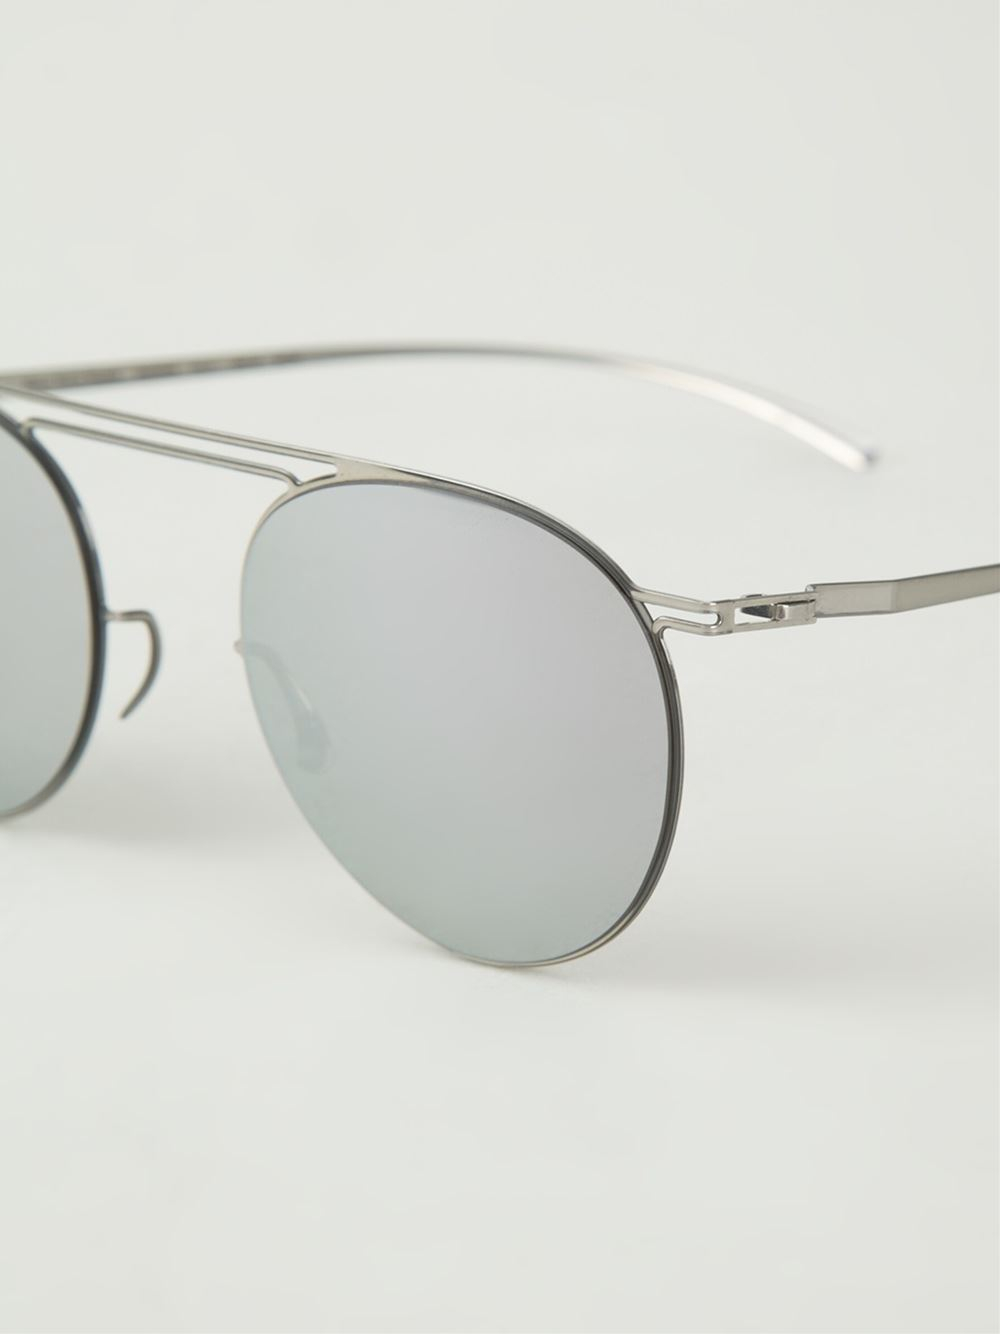 Mykita maison martin margiela x mmesse009 sunglasses in for Martin margiela glasses